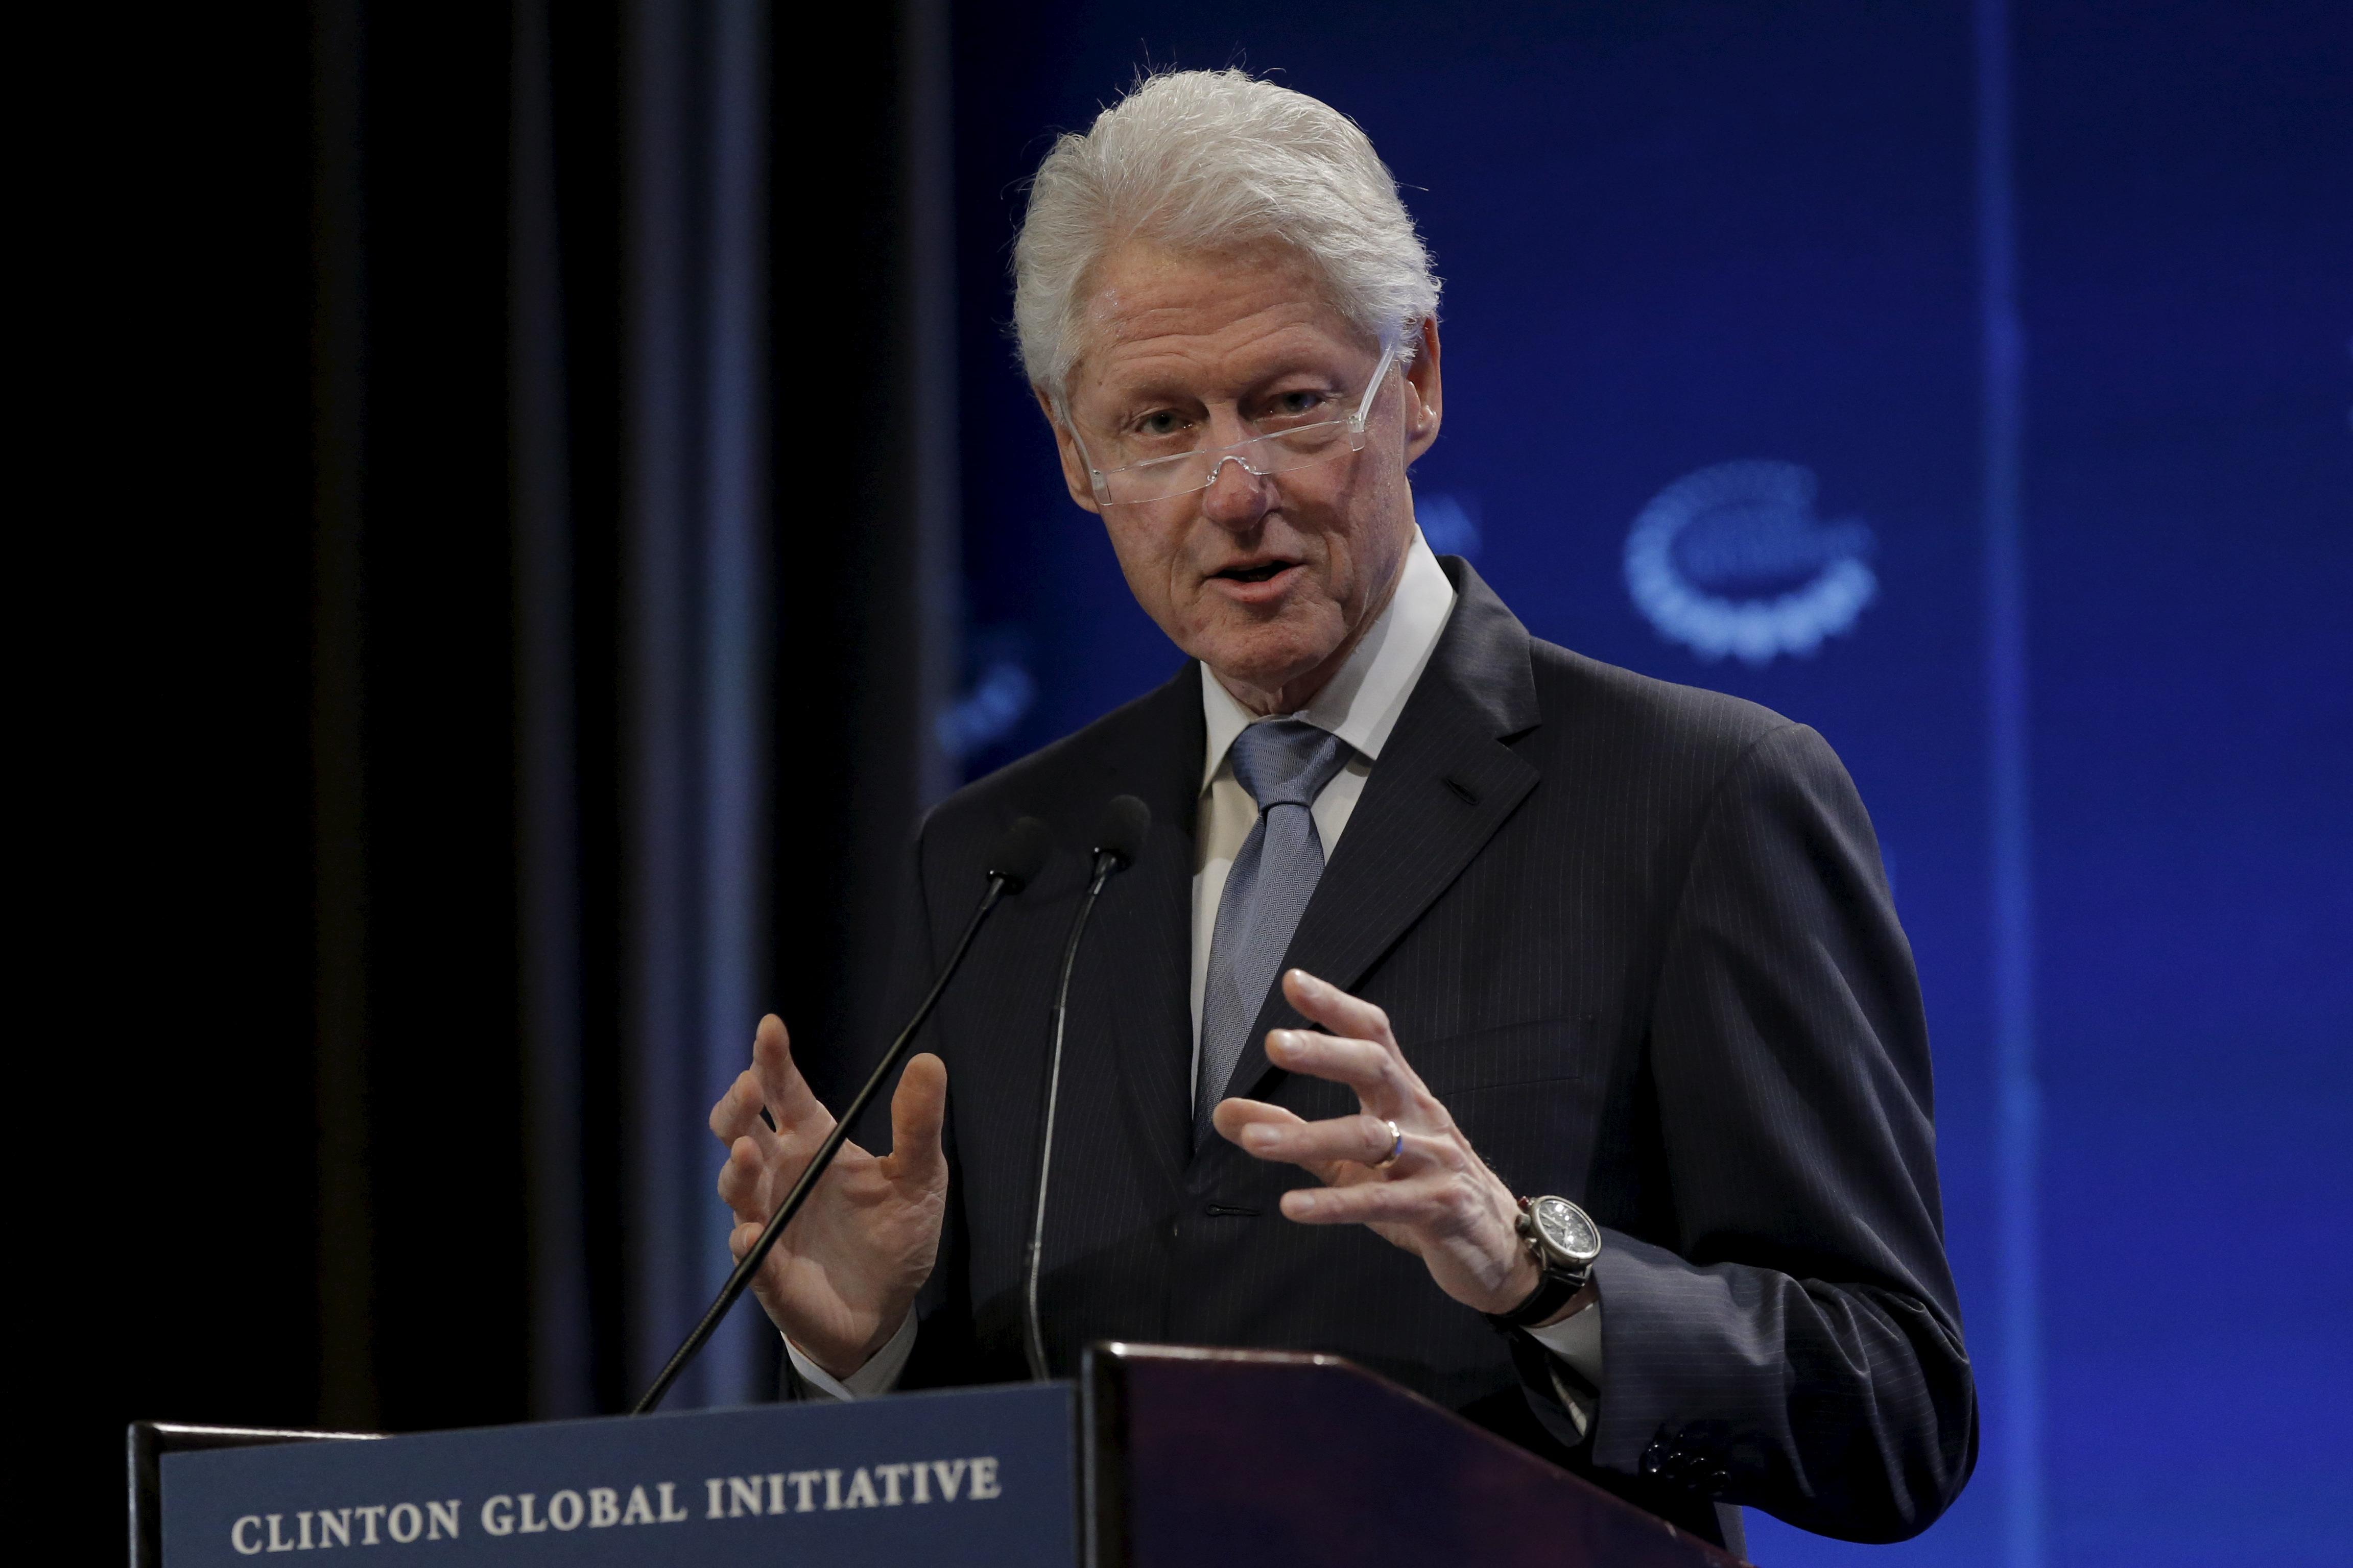 Former U.S. President Bill Clinton speaks during the Clinton Global Initiative's winter meeting in New York, February 4, 2016. REUTERS/Brendan McDermid - RTX25HBP